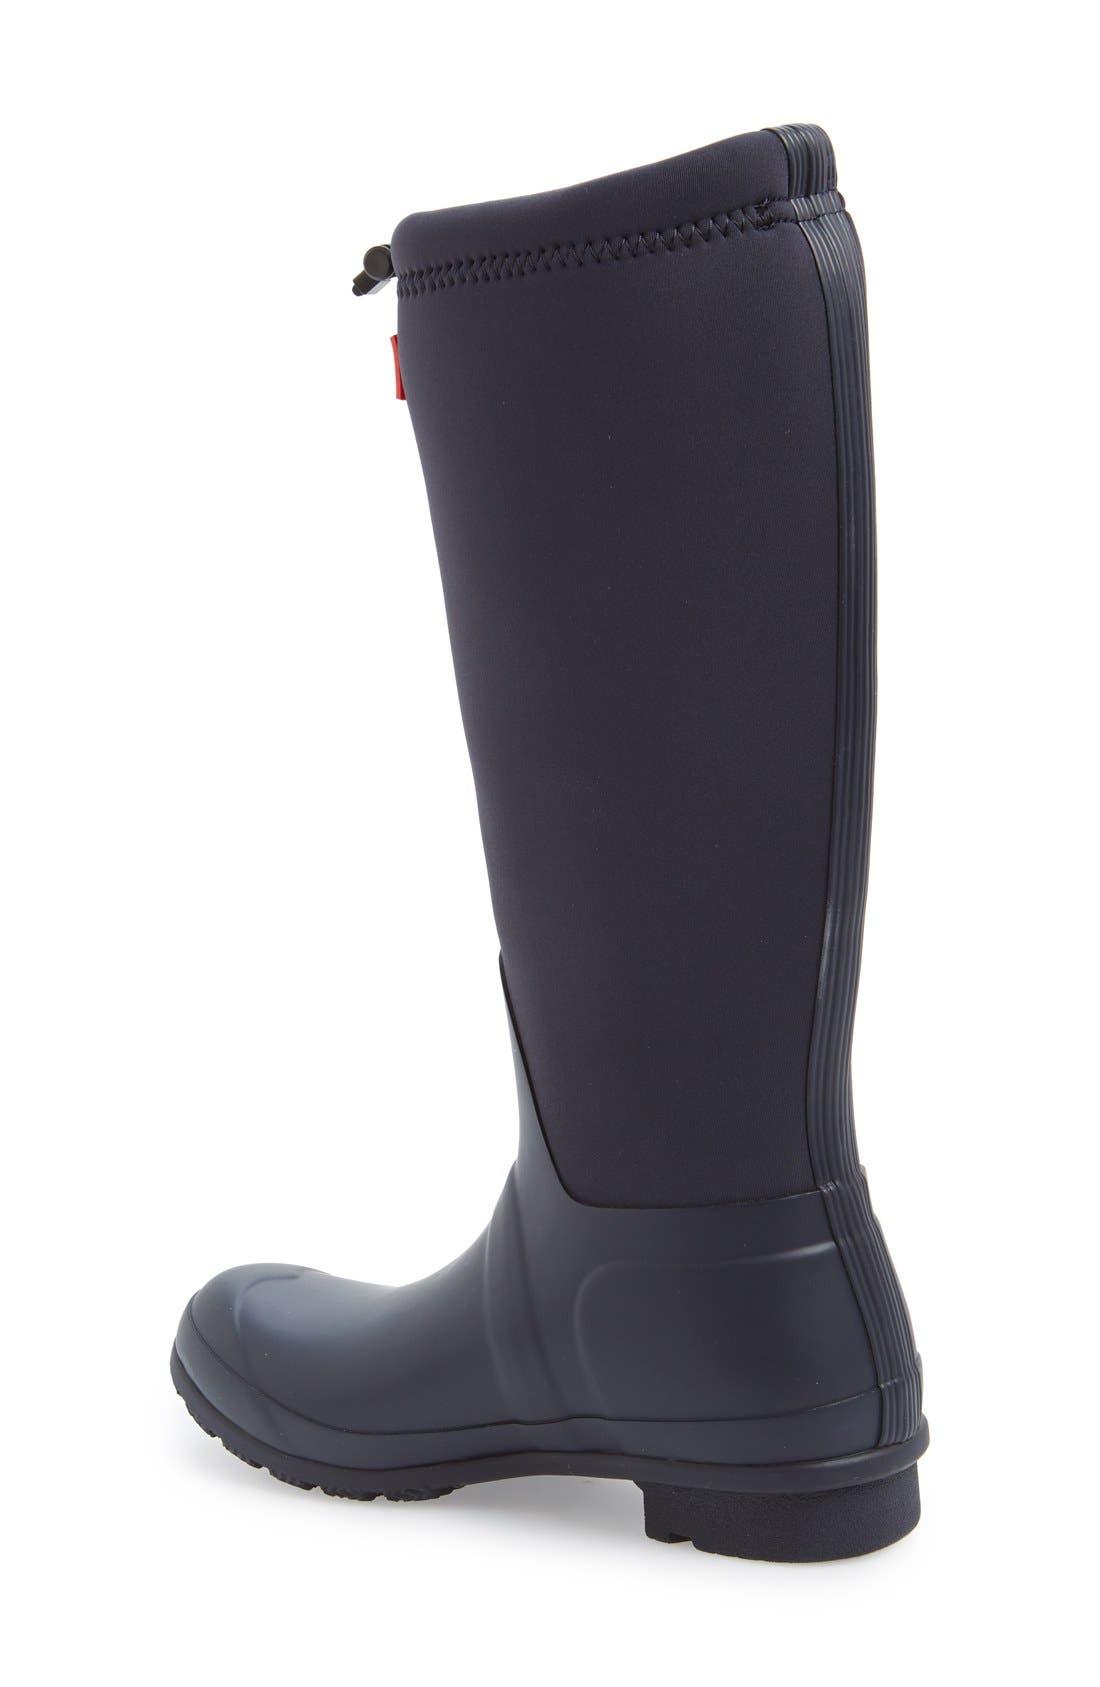 Alternate Image 2  - Hunter 'Original Tour' Neoprene Waterproof Boot (Women)